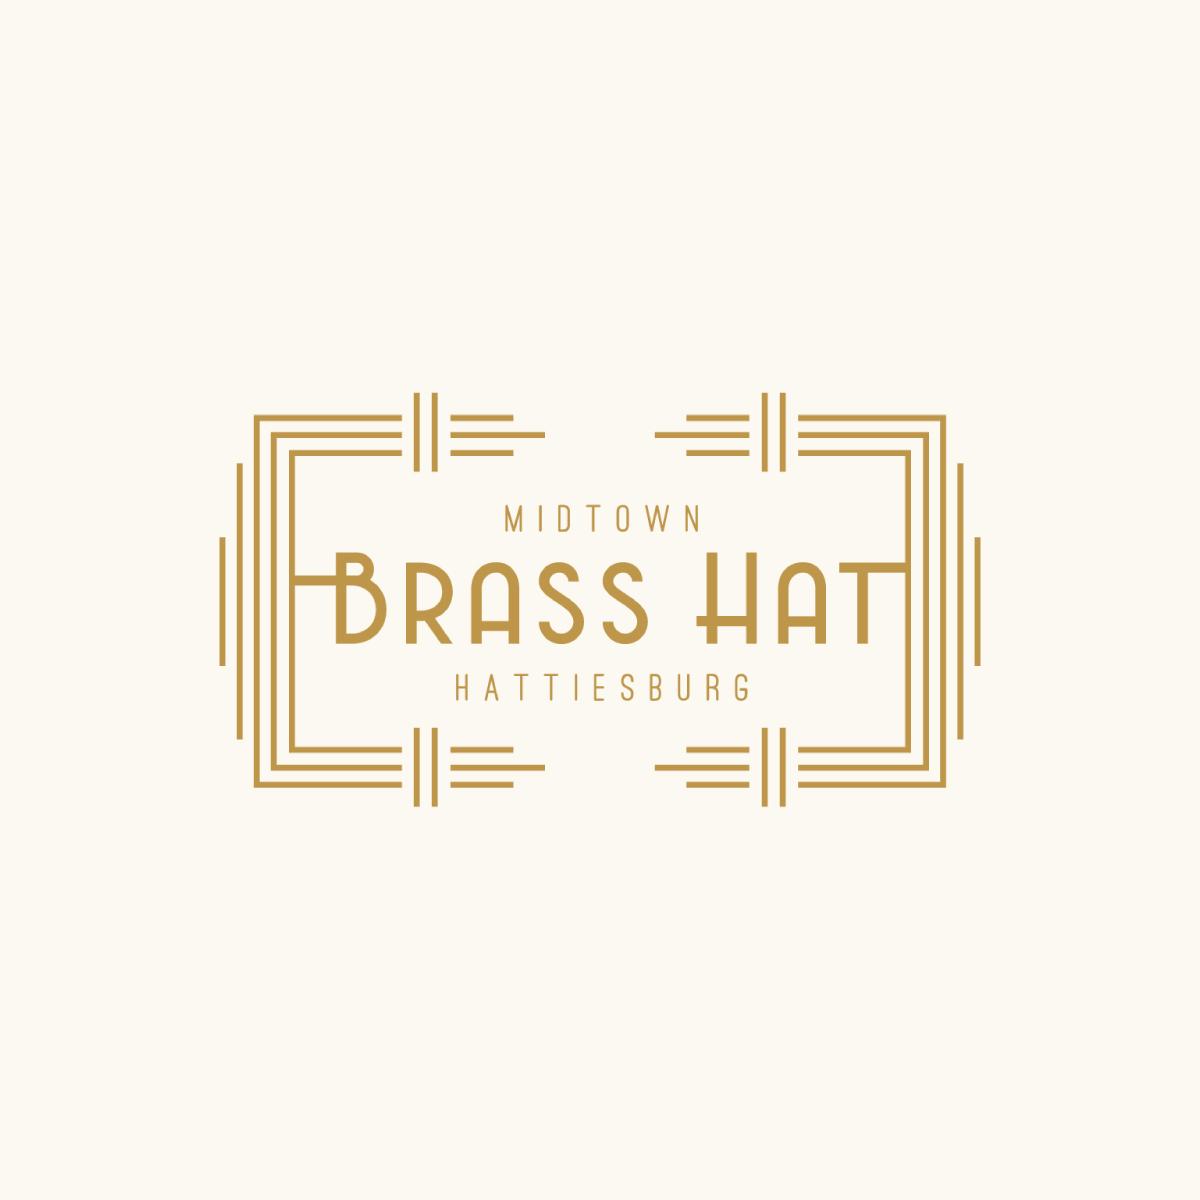 BrassHat2.jpg